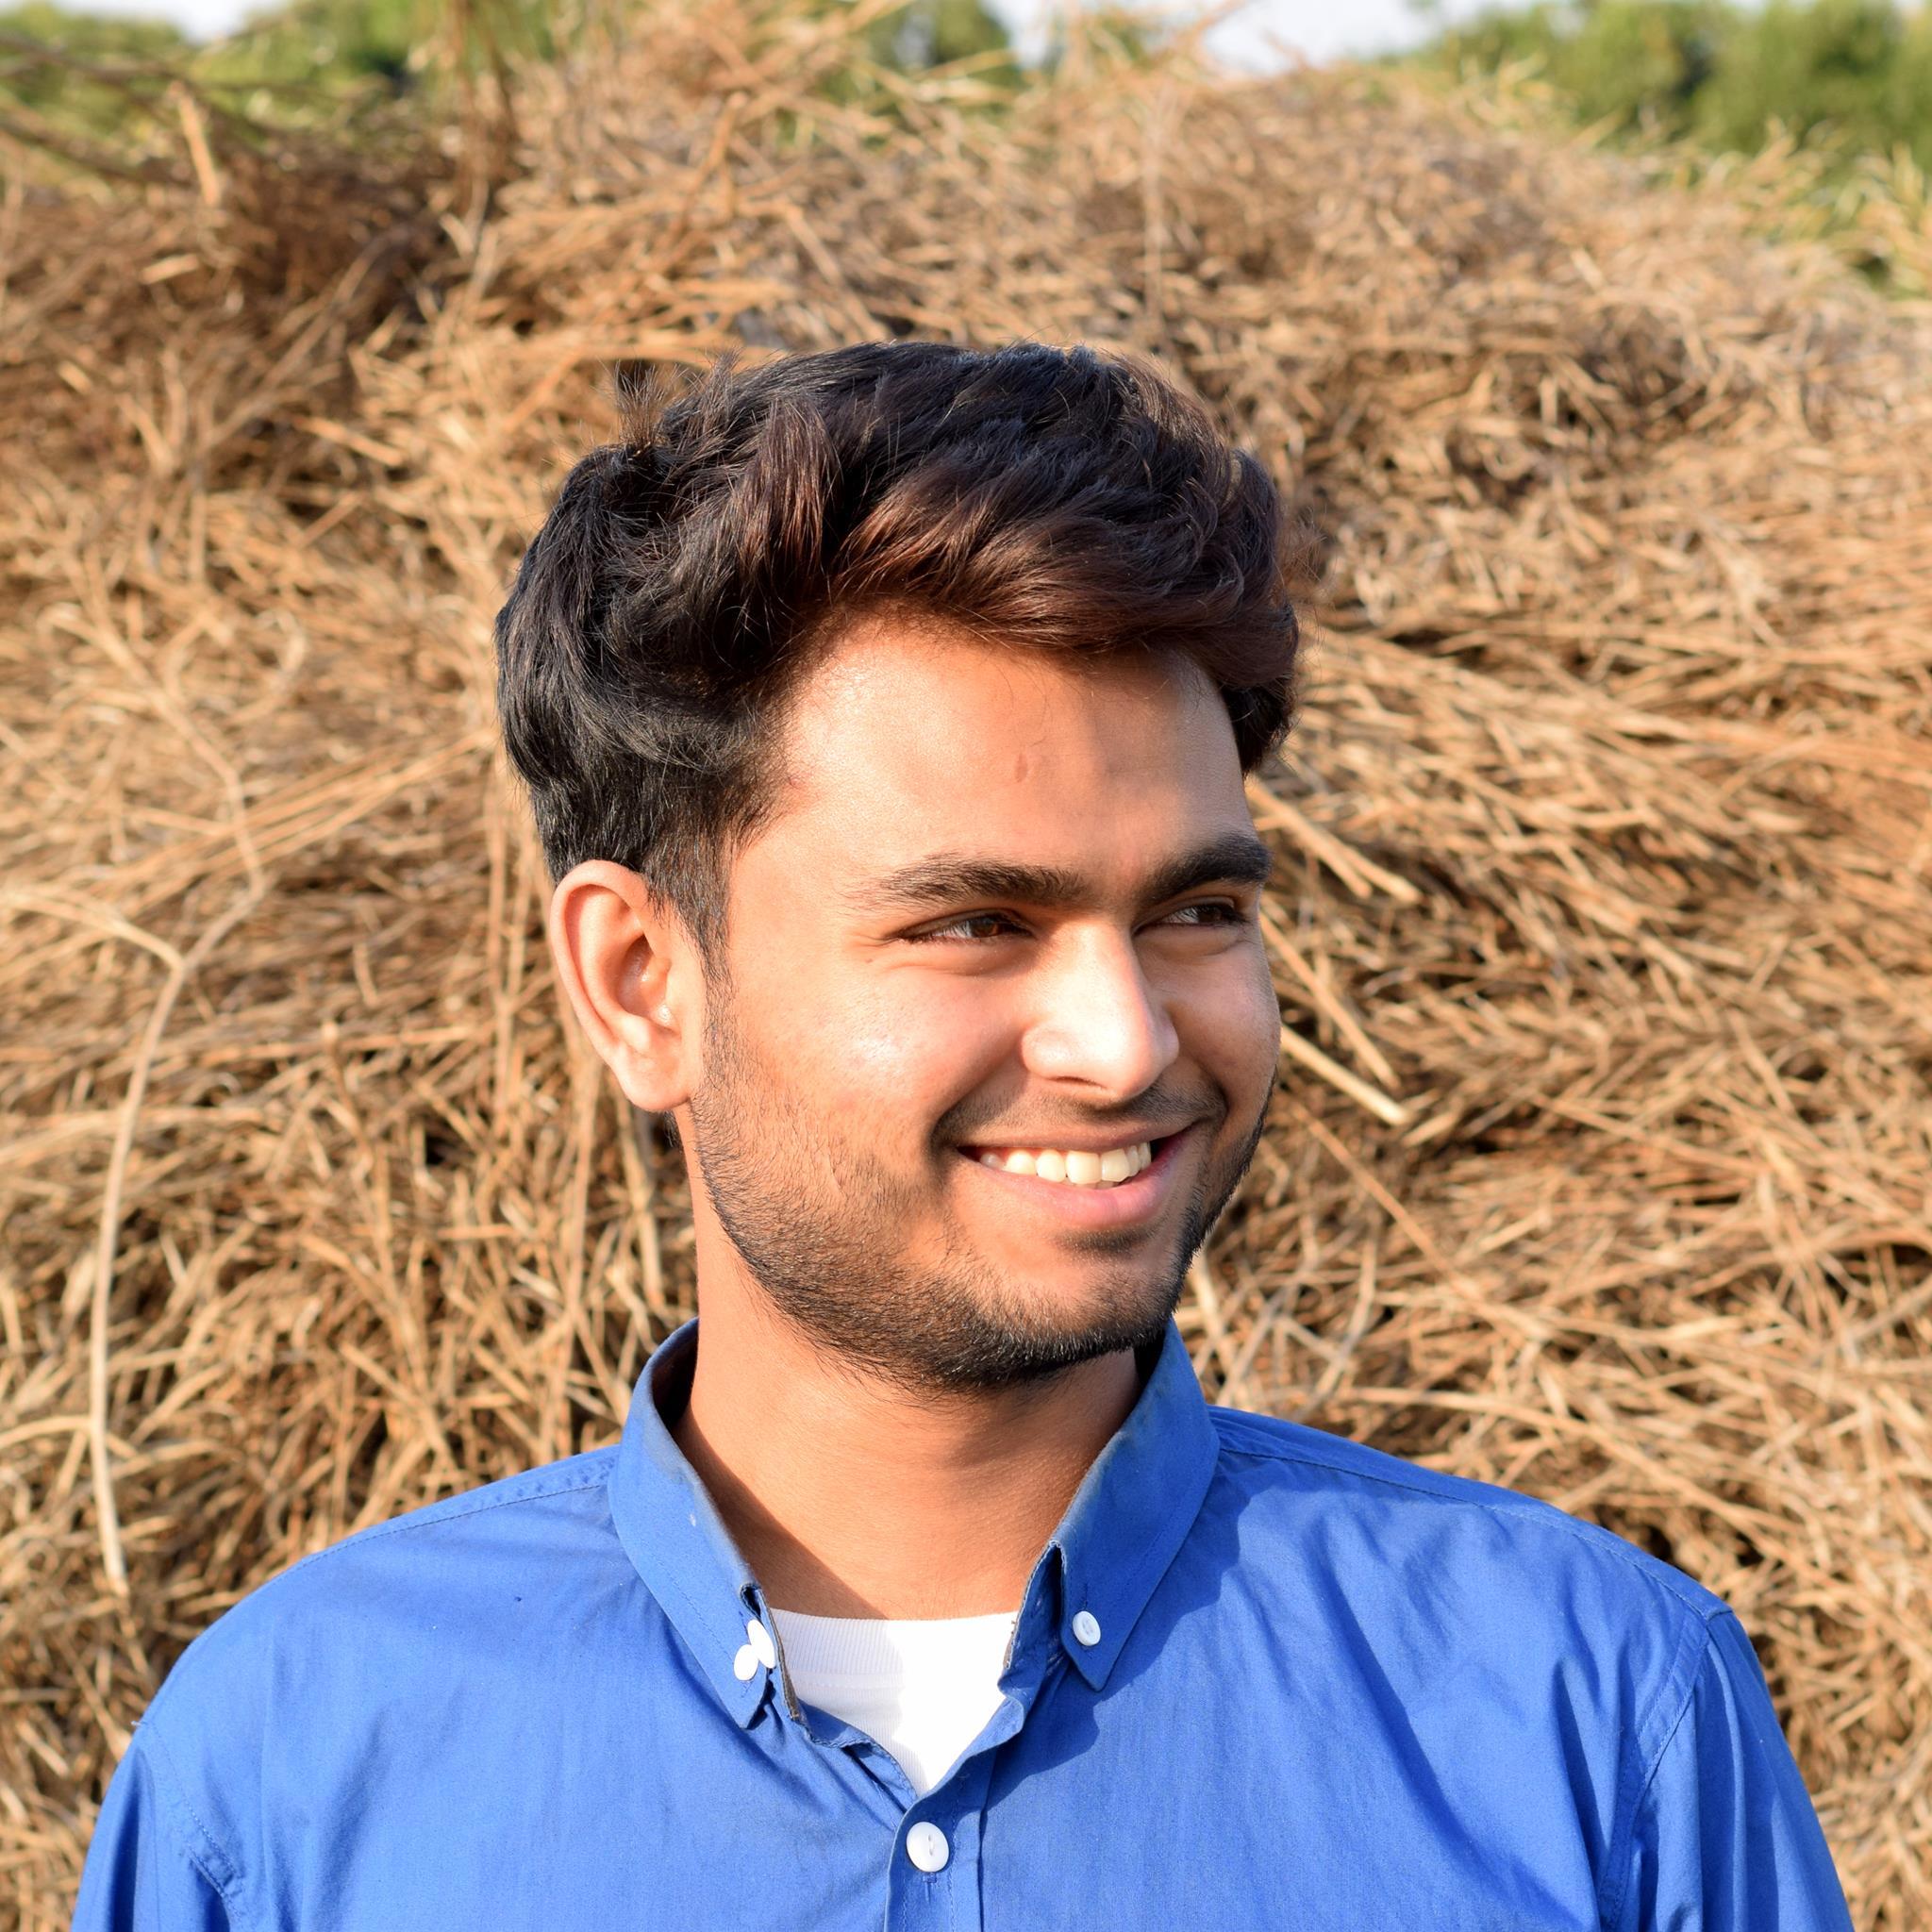 A smiling photo of Mahmudul Hasan